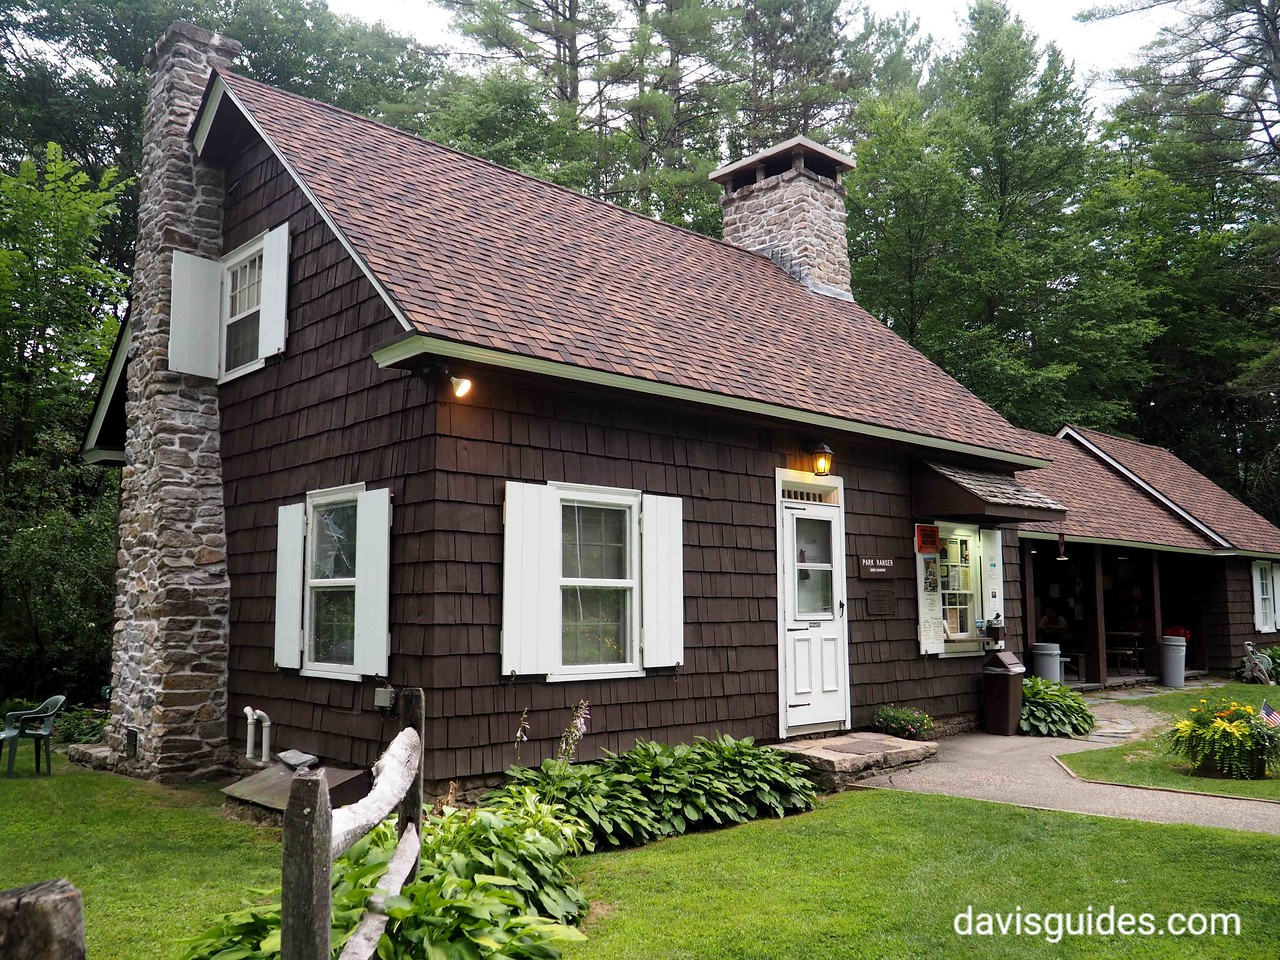 Caretaker cottage, Wilgus State Park, NY